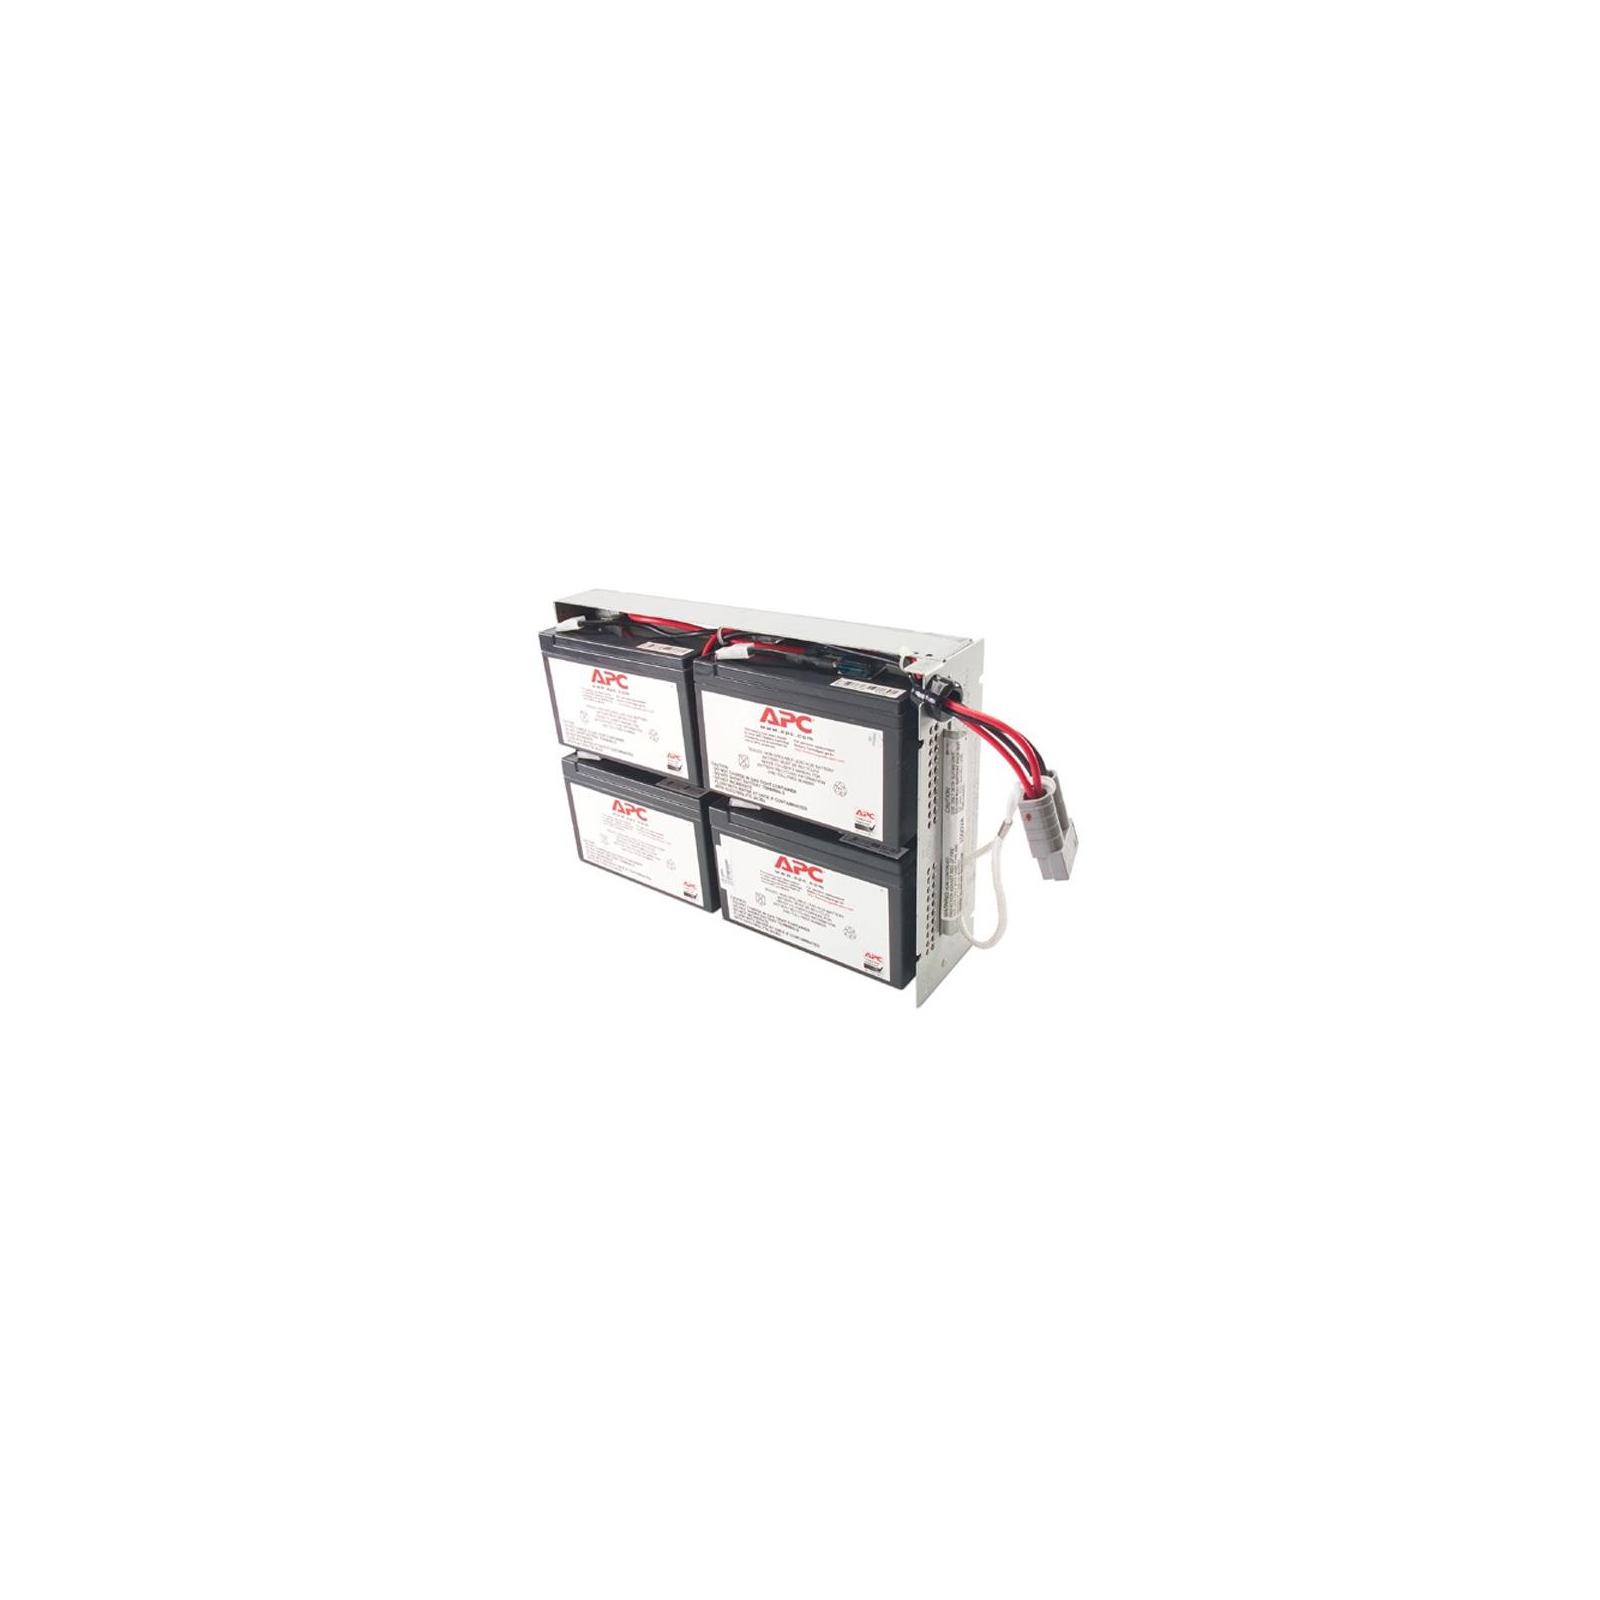 Батарея к ИБП Replacement Battery Cartridge #23 APC (RBC23)